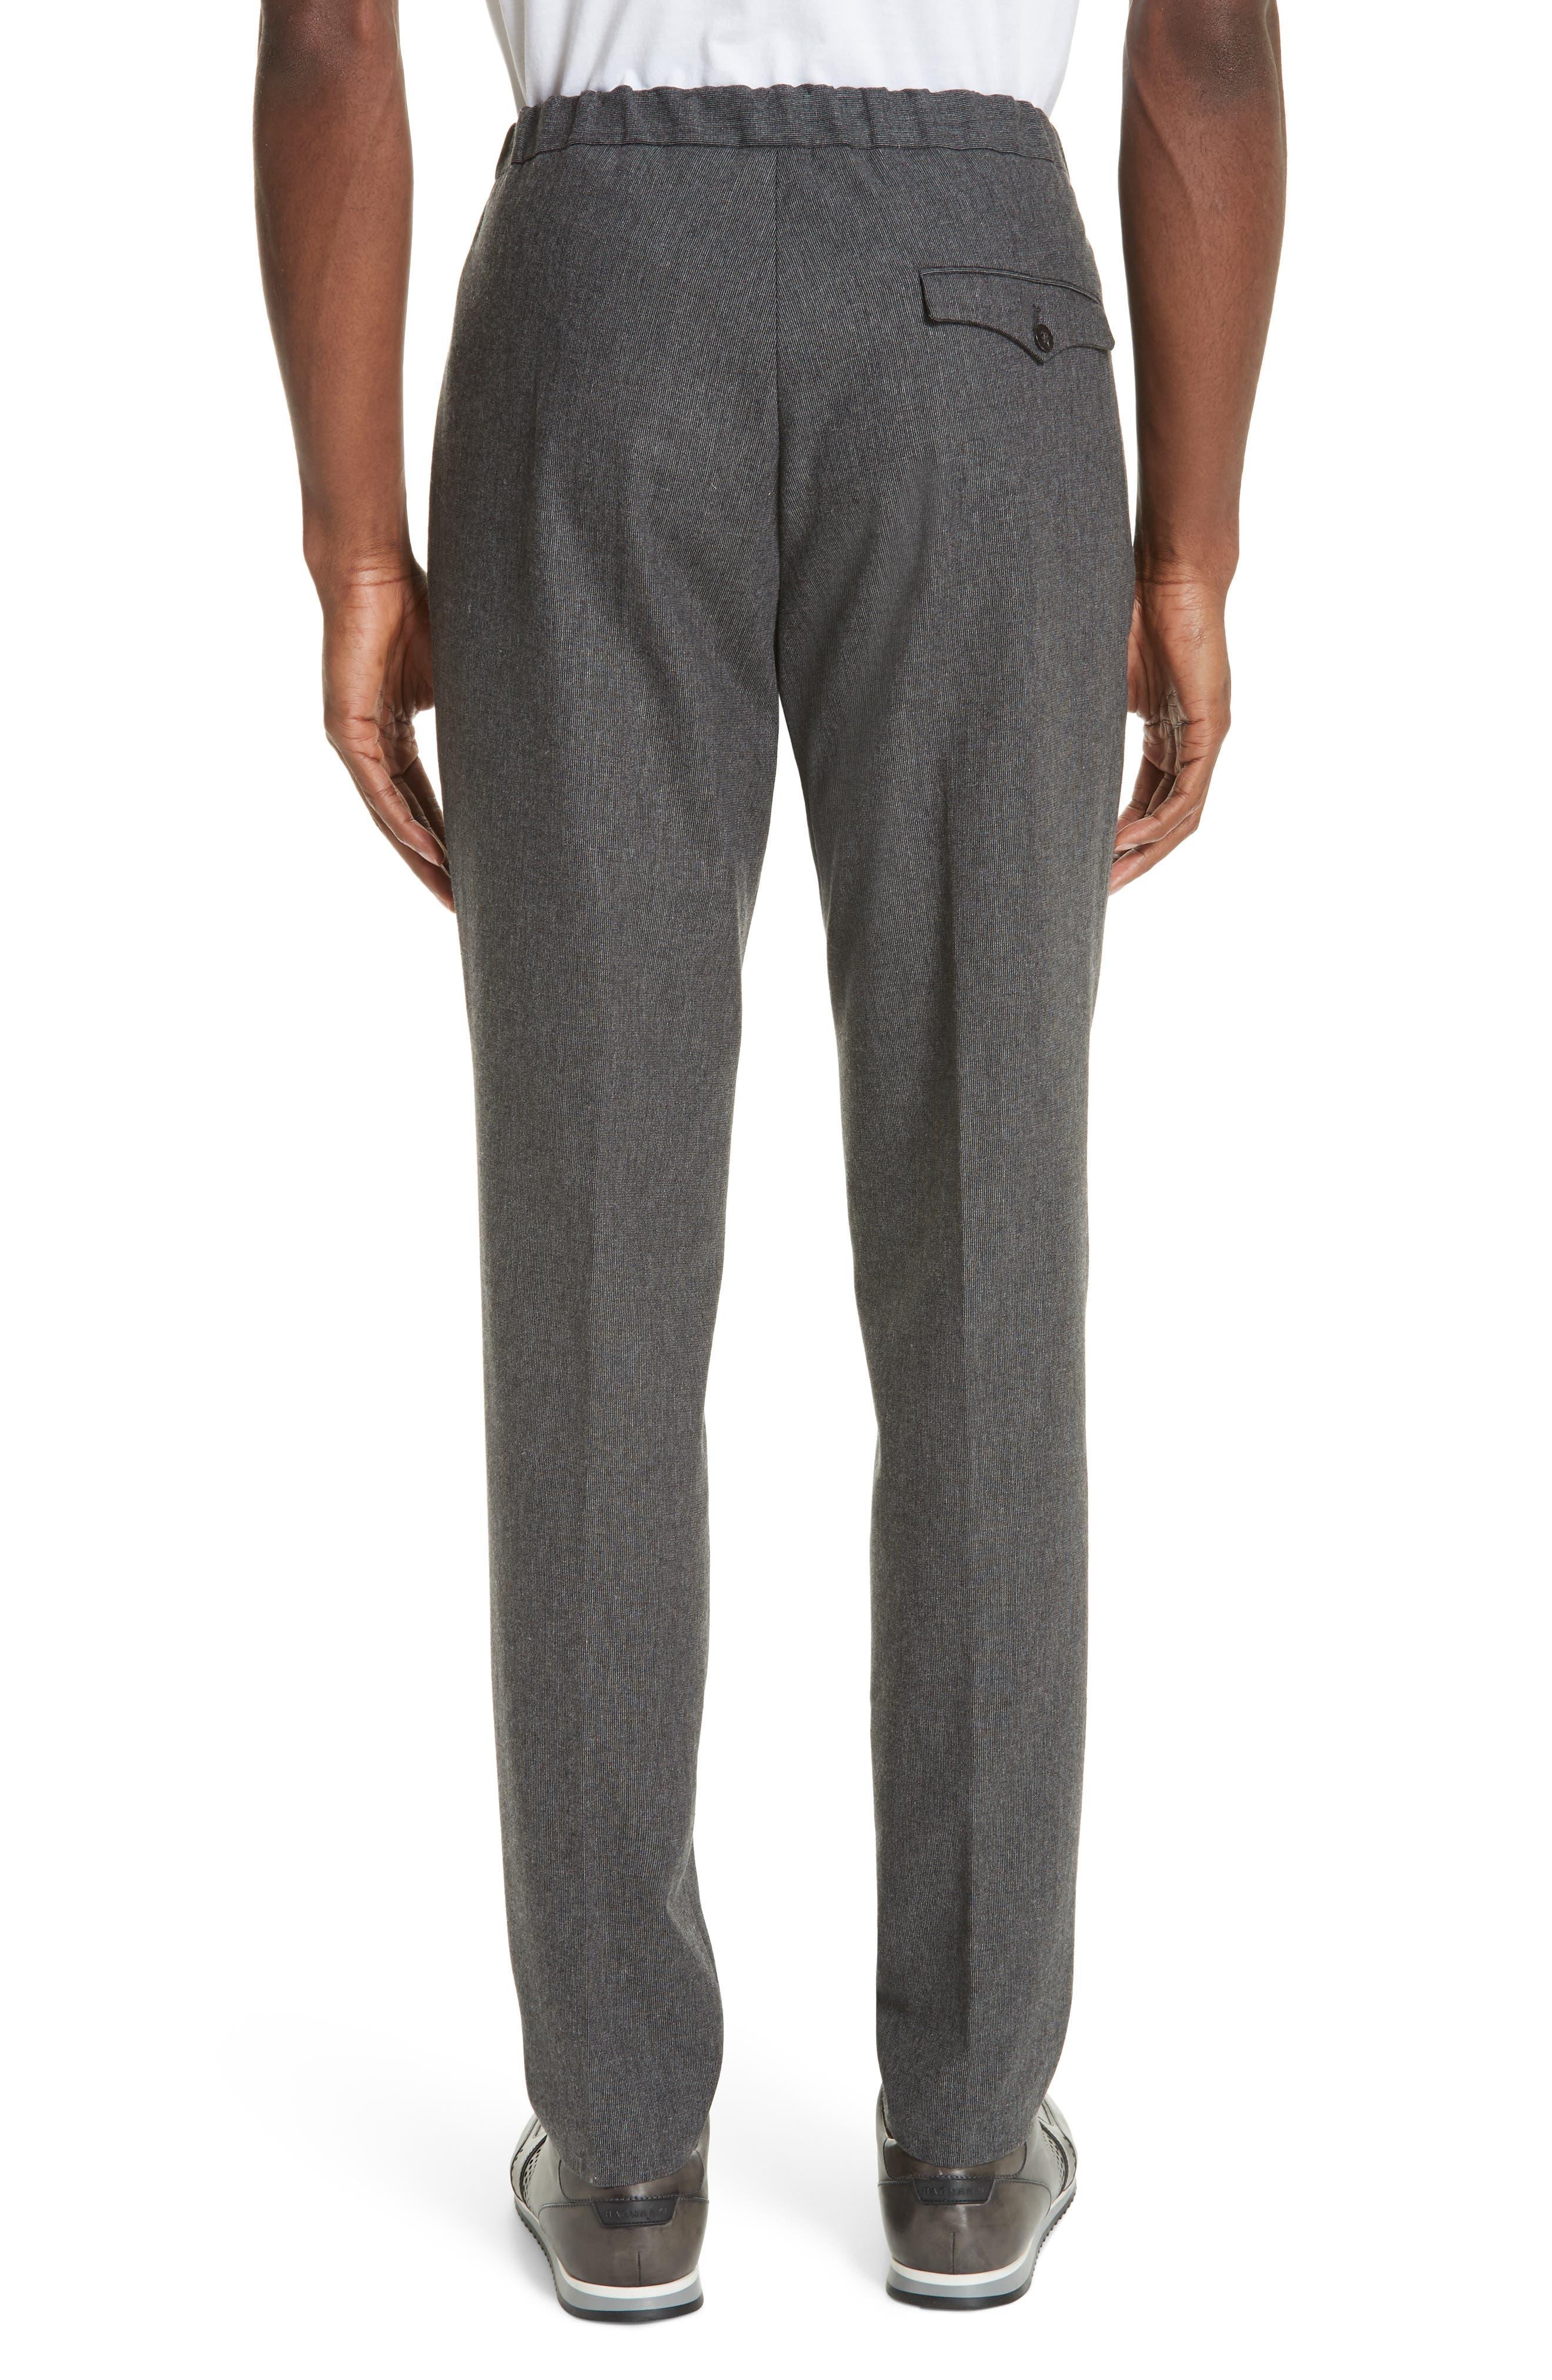 Trim Fit Sport Trousers,                             Alternate thumbnail 2, color,                             CHARCOAL